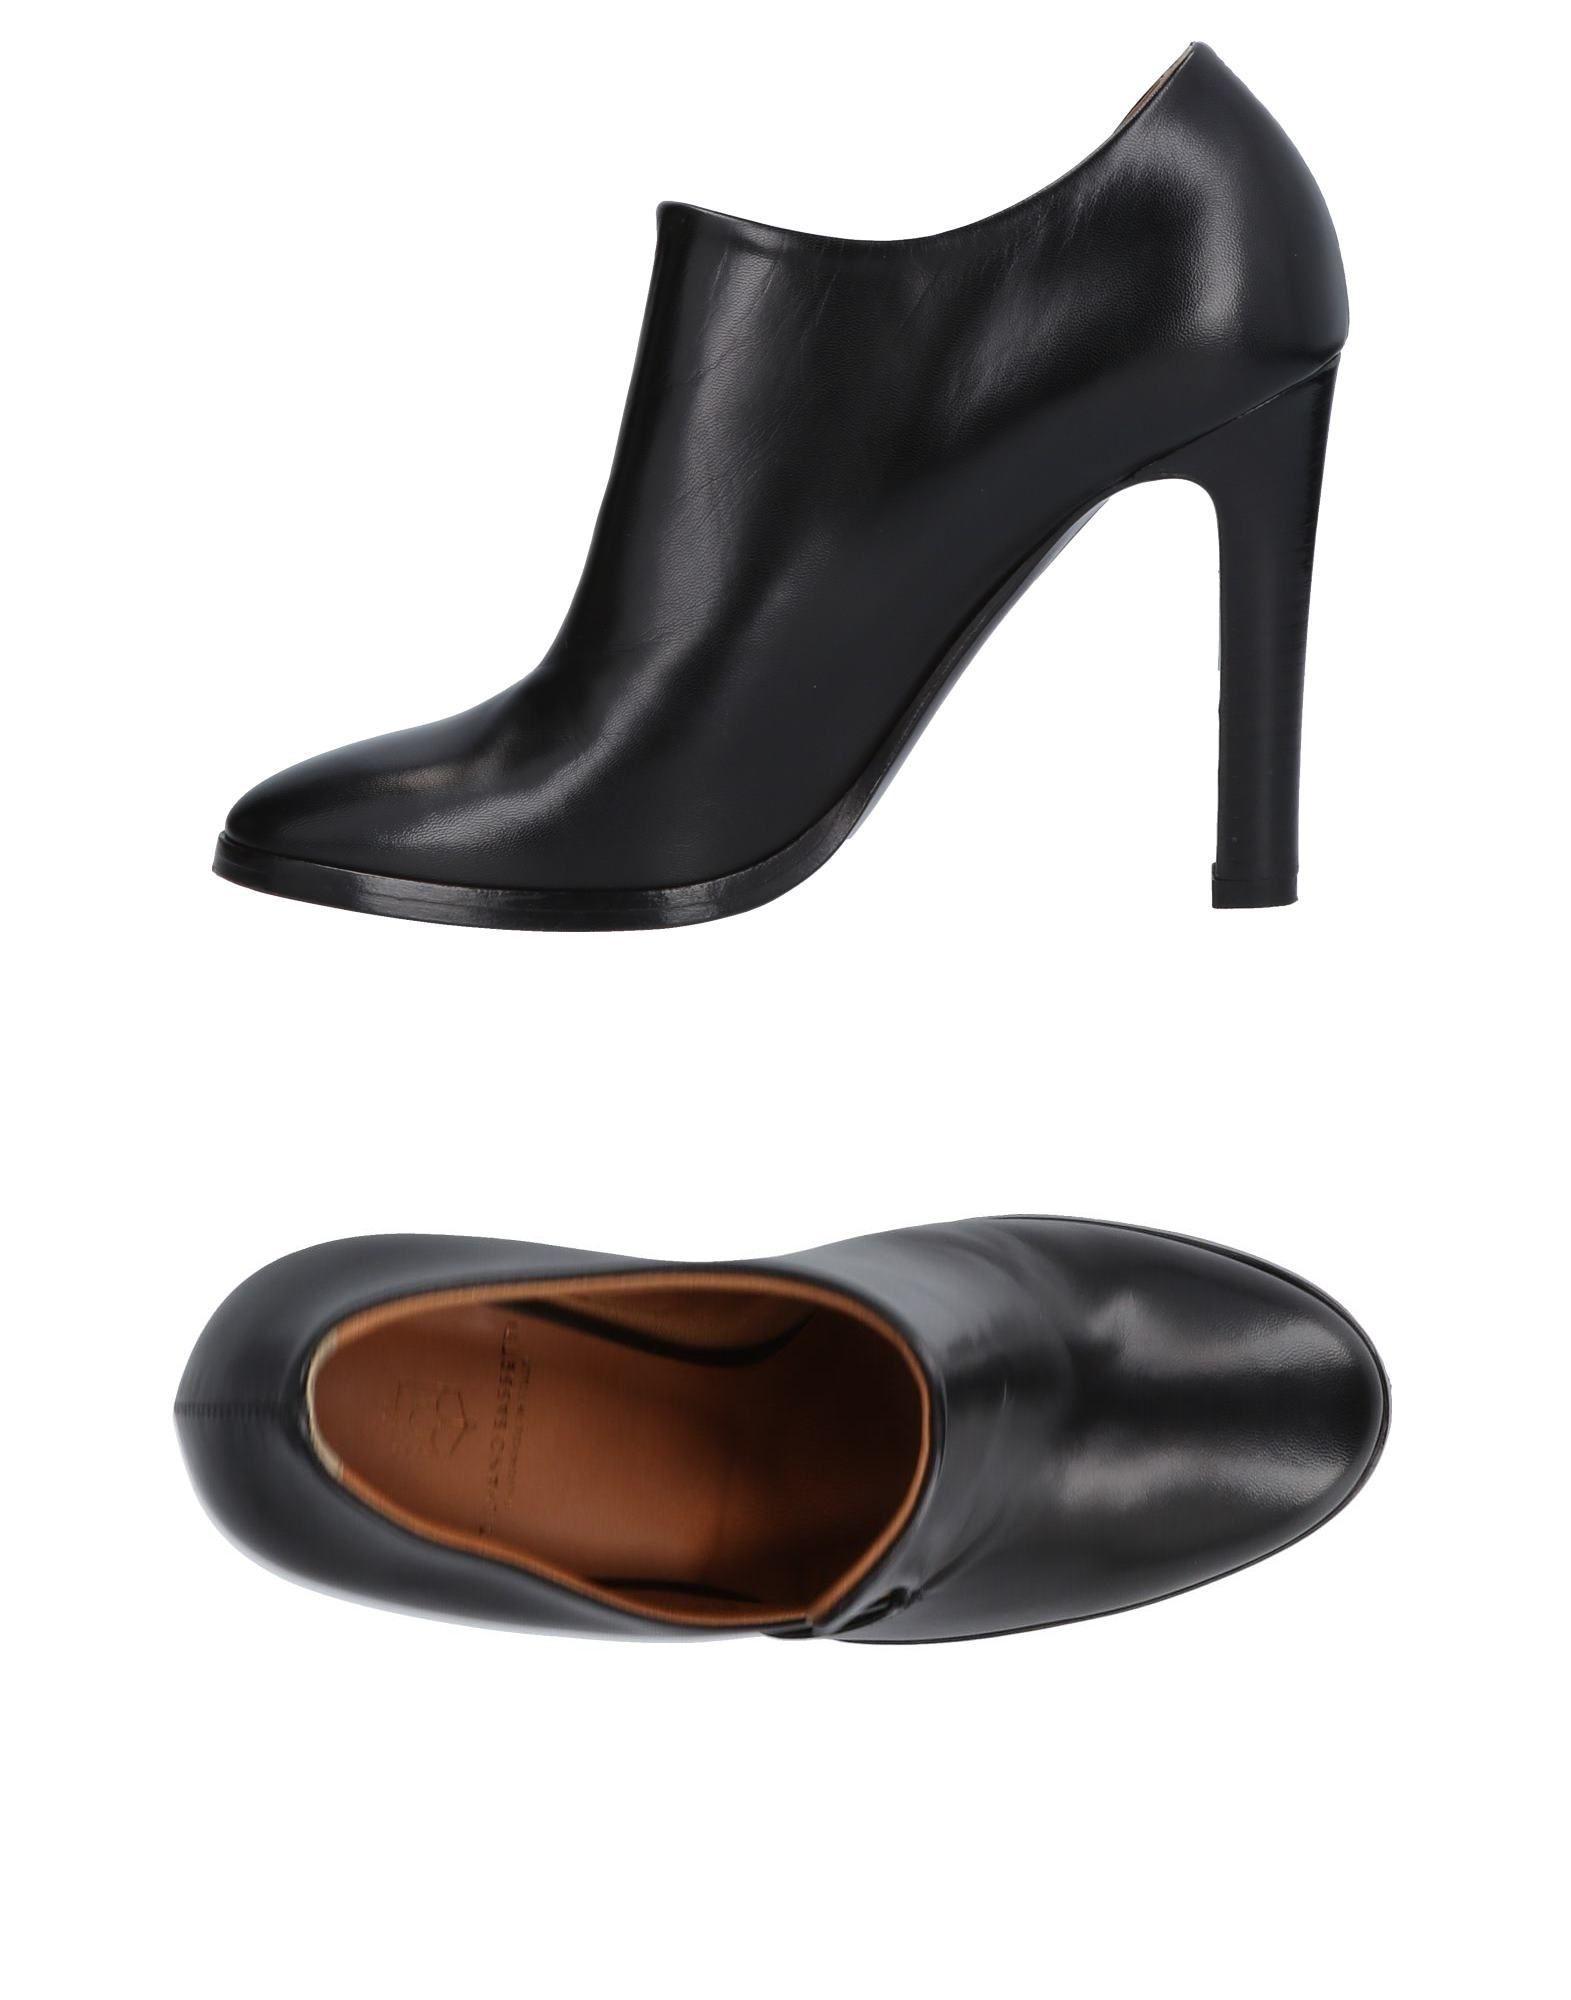 Silvano Sassetti Ankle Sassetti Boot - Women Silvano Sassetti Ankle Ankle Boots online on  Australia - 11456978SV 42fc9f